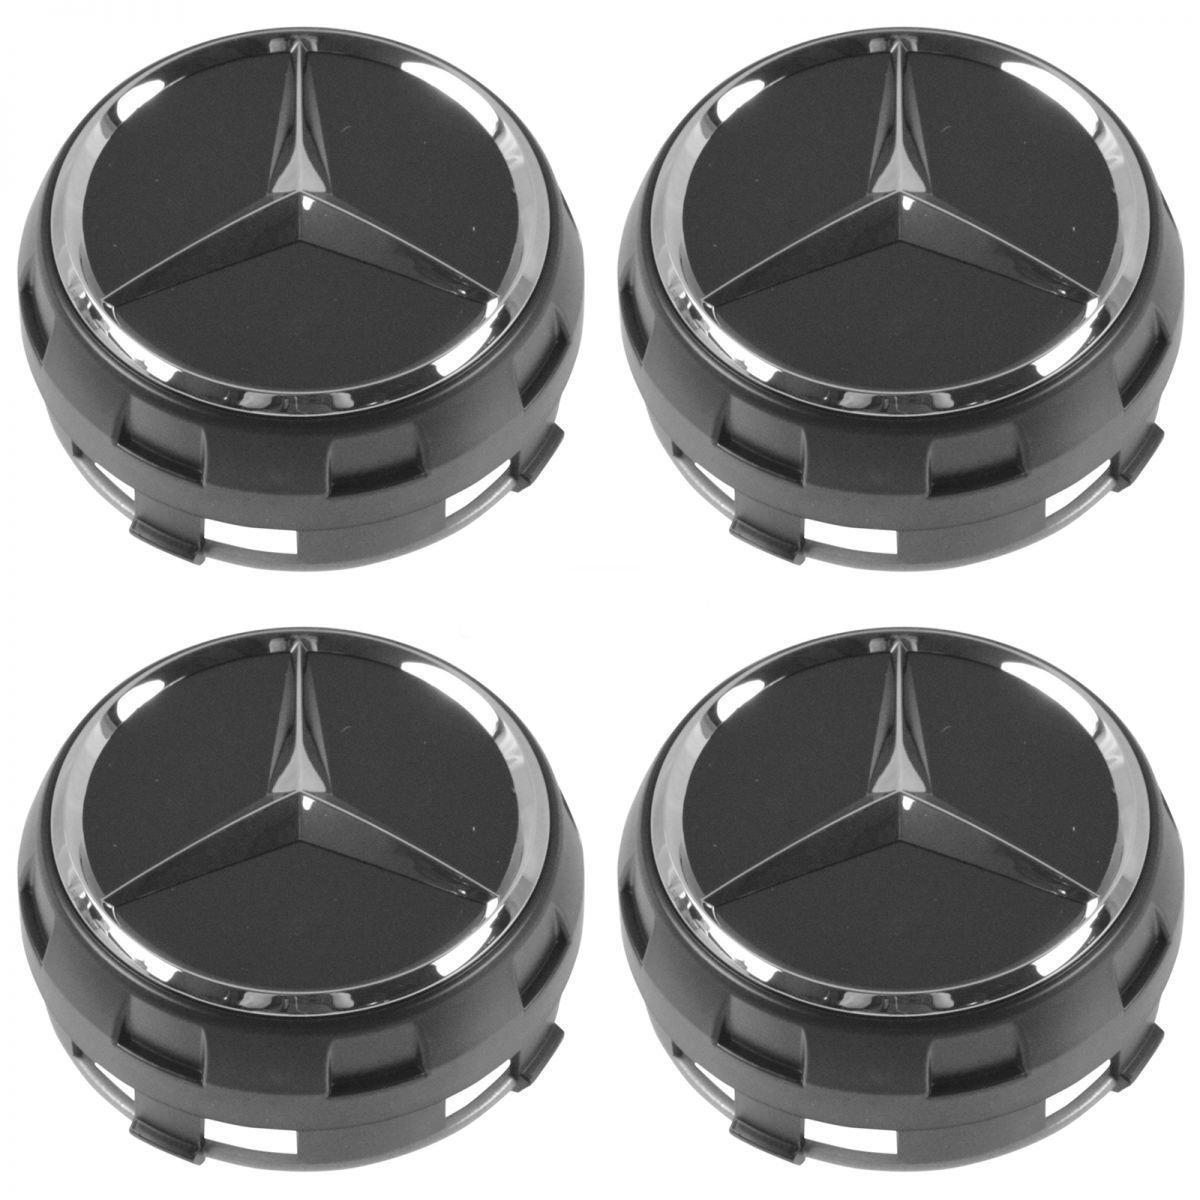 Fits-OEM Raised Chrome & Black Wheel Center Cap Set of 4 for Mercedes Benz